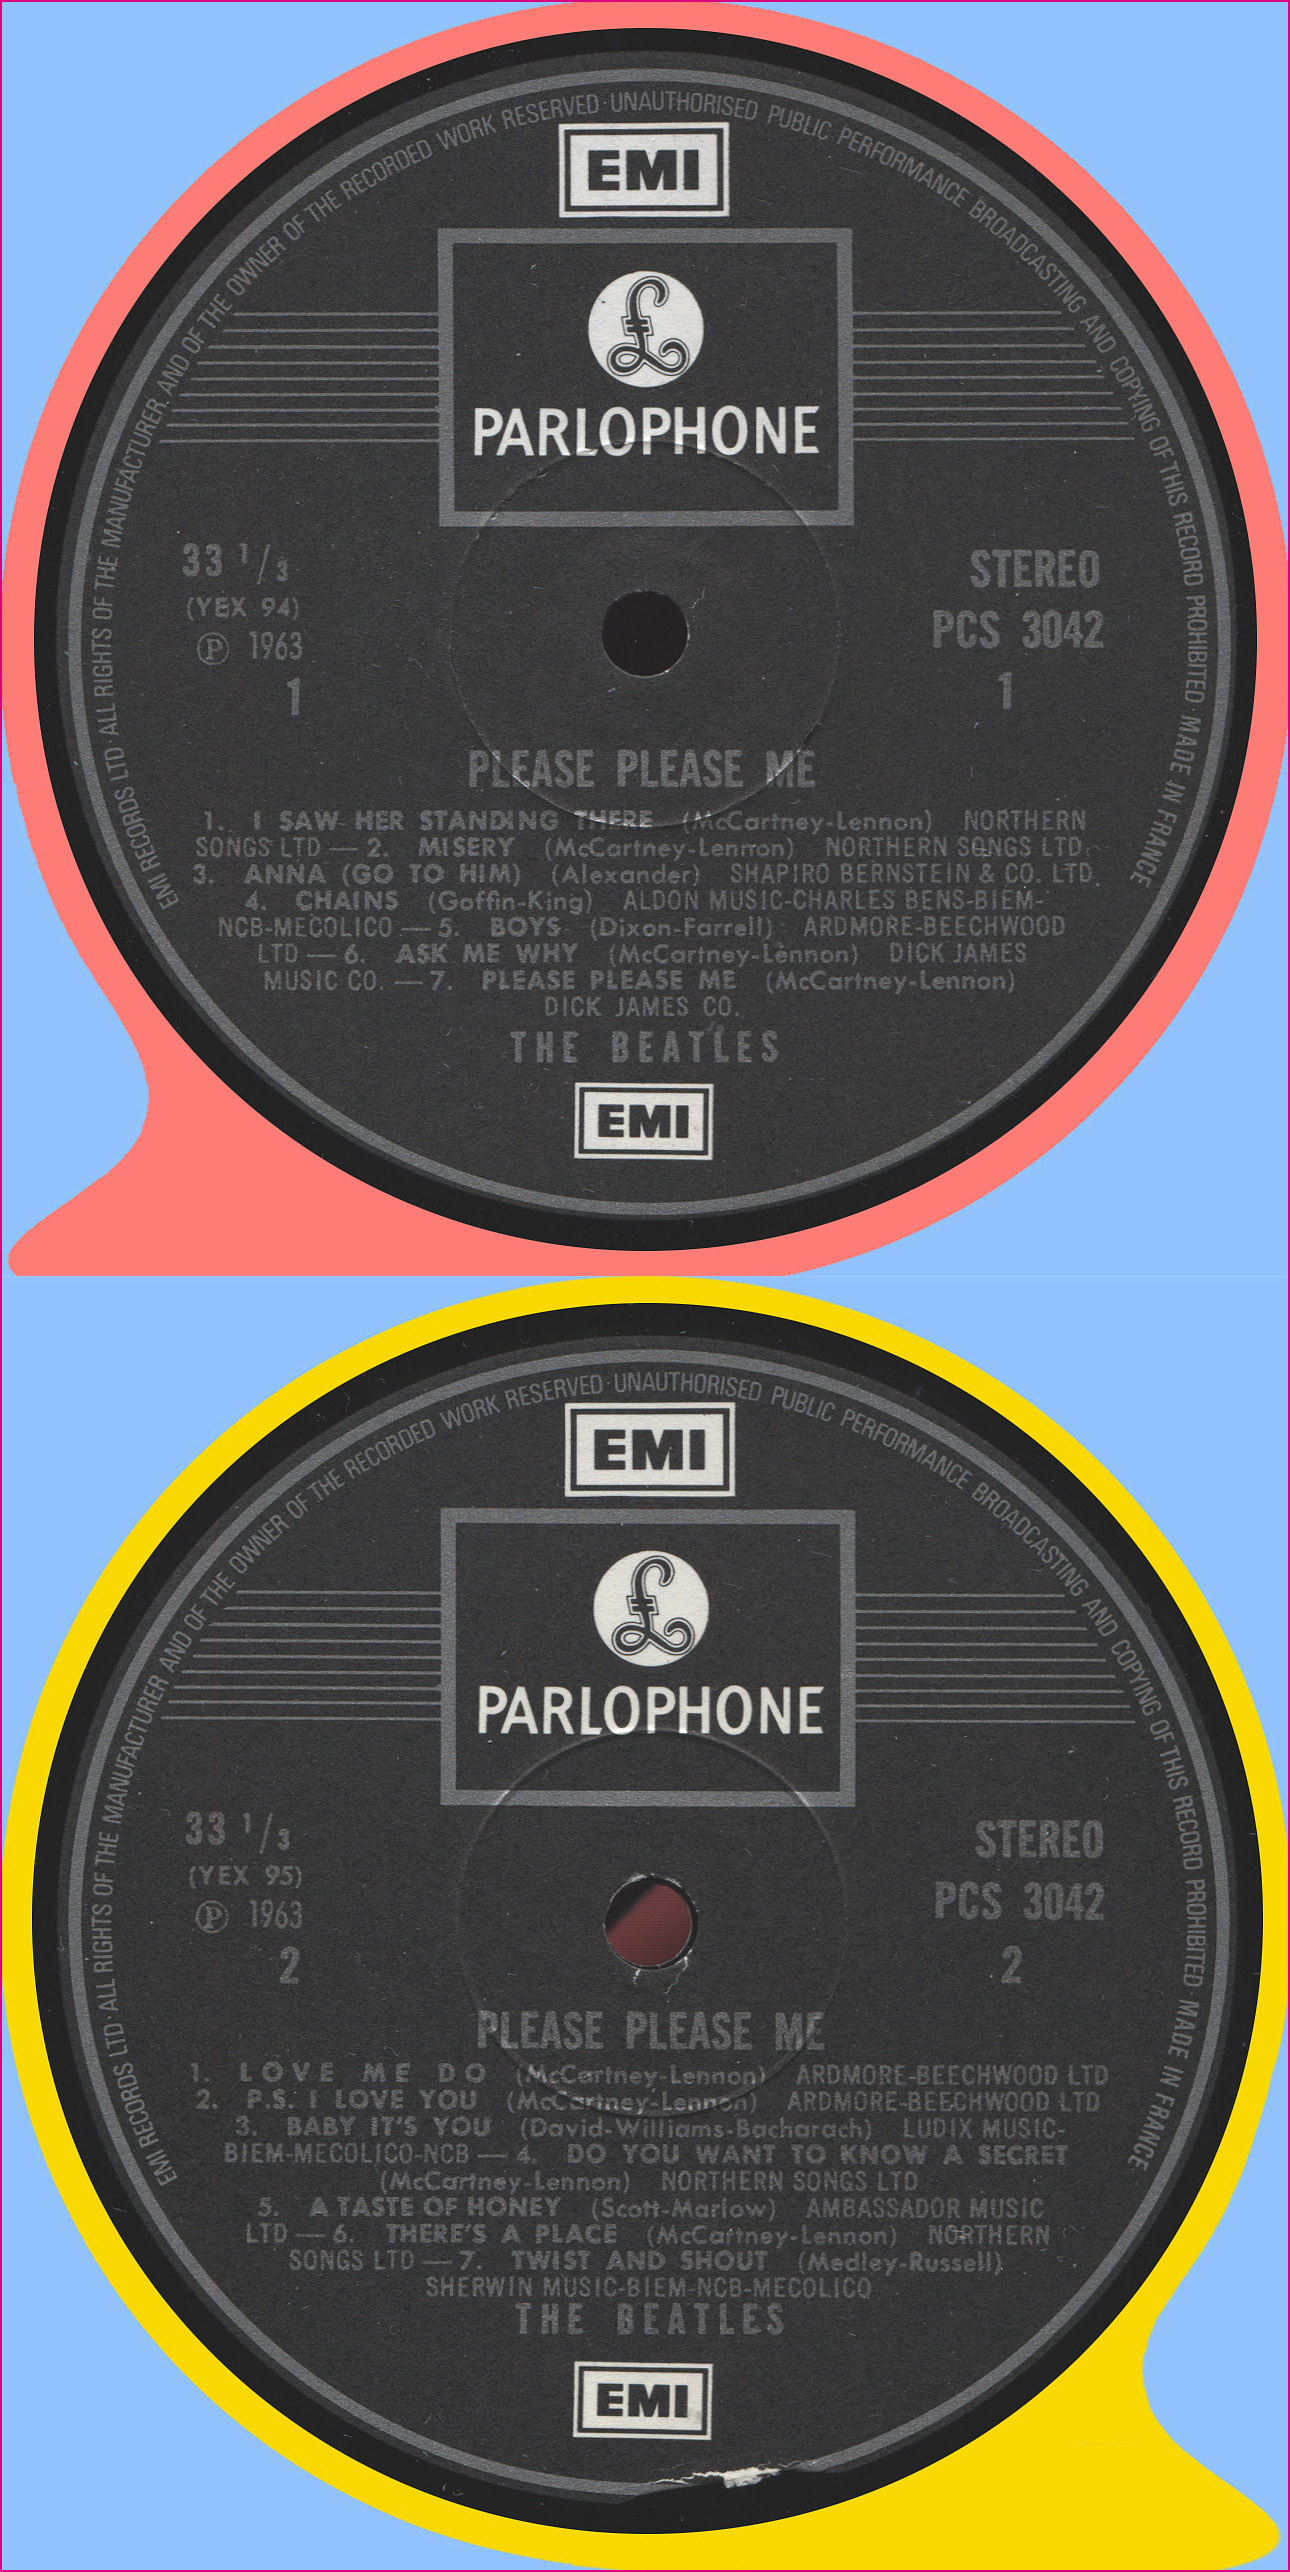 Beatles63PleasePleaseMe_label.jpg